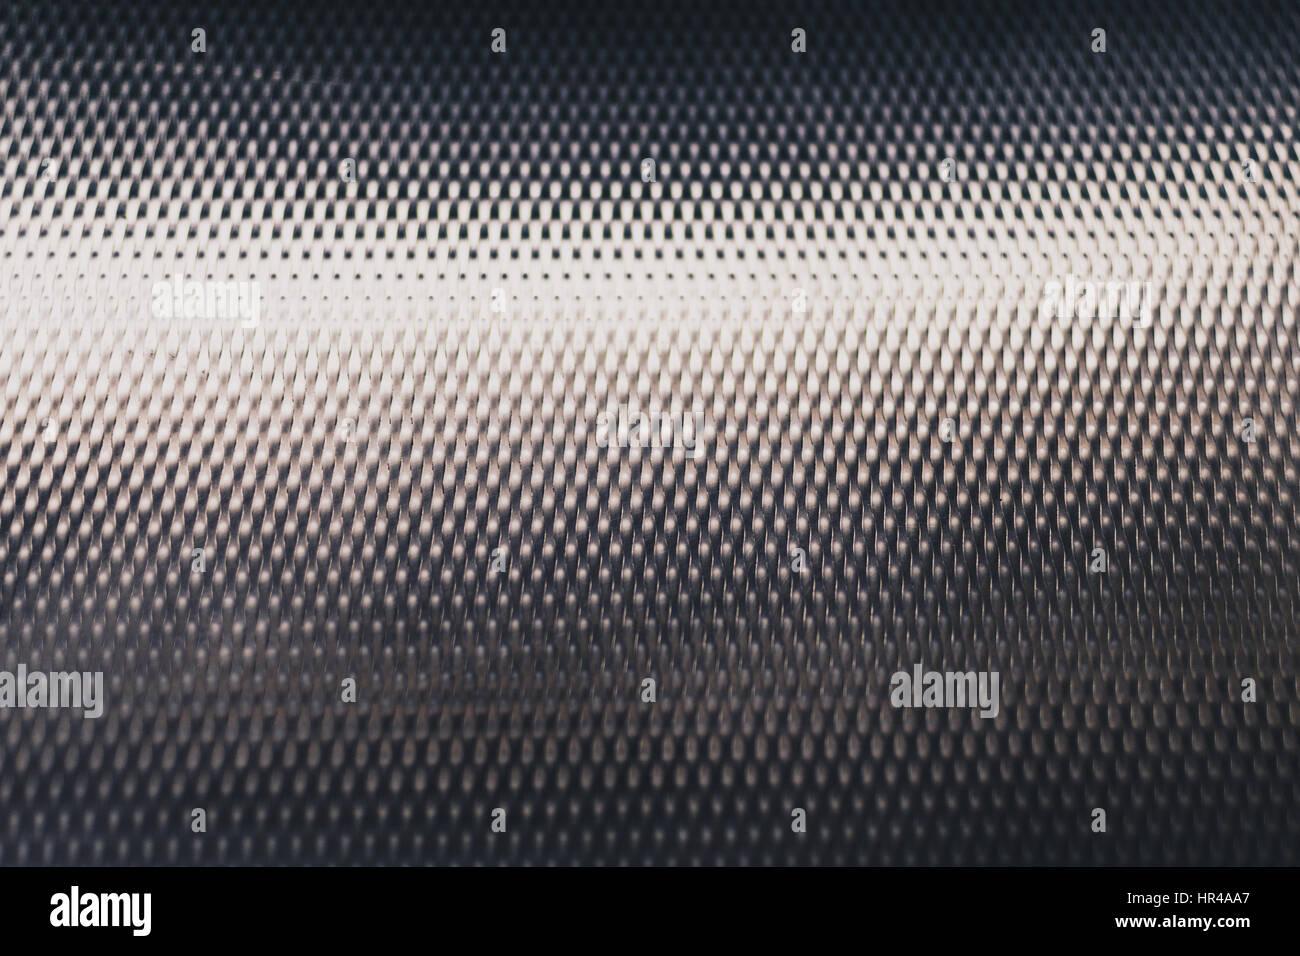 Textured steel surface - Stock Image